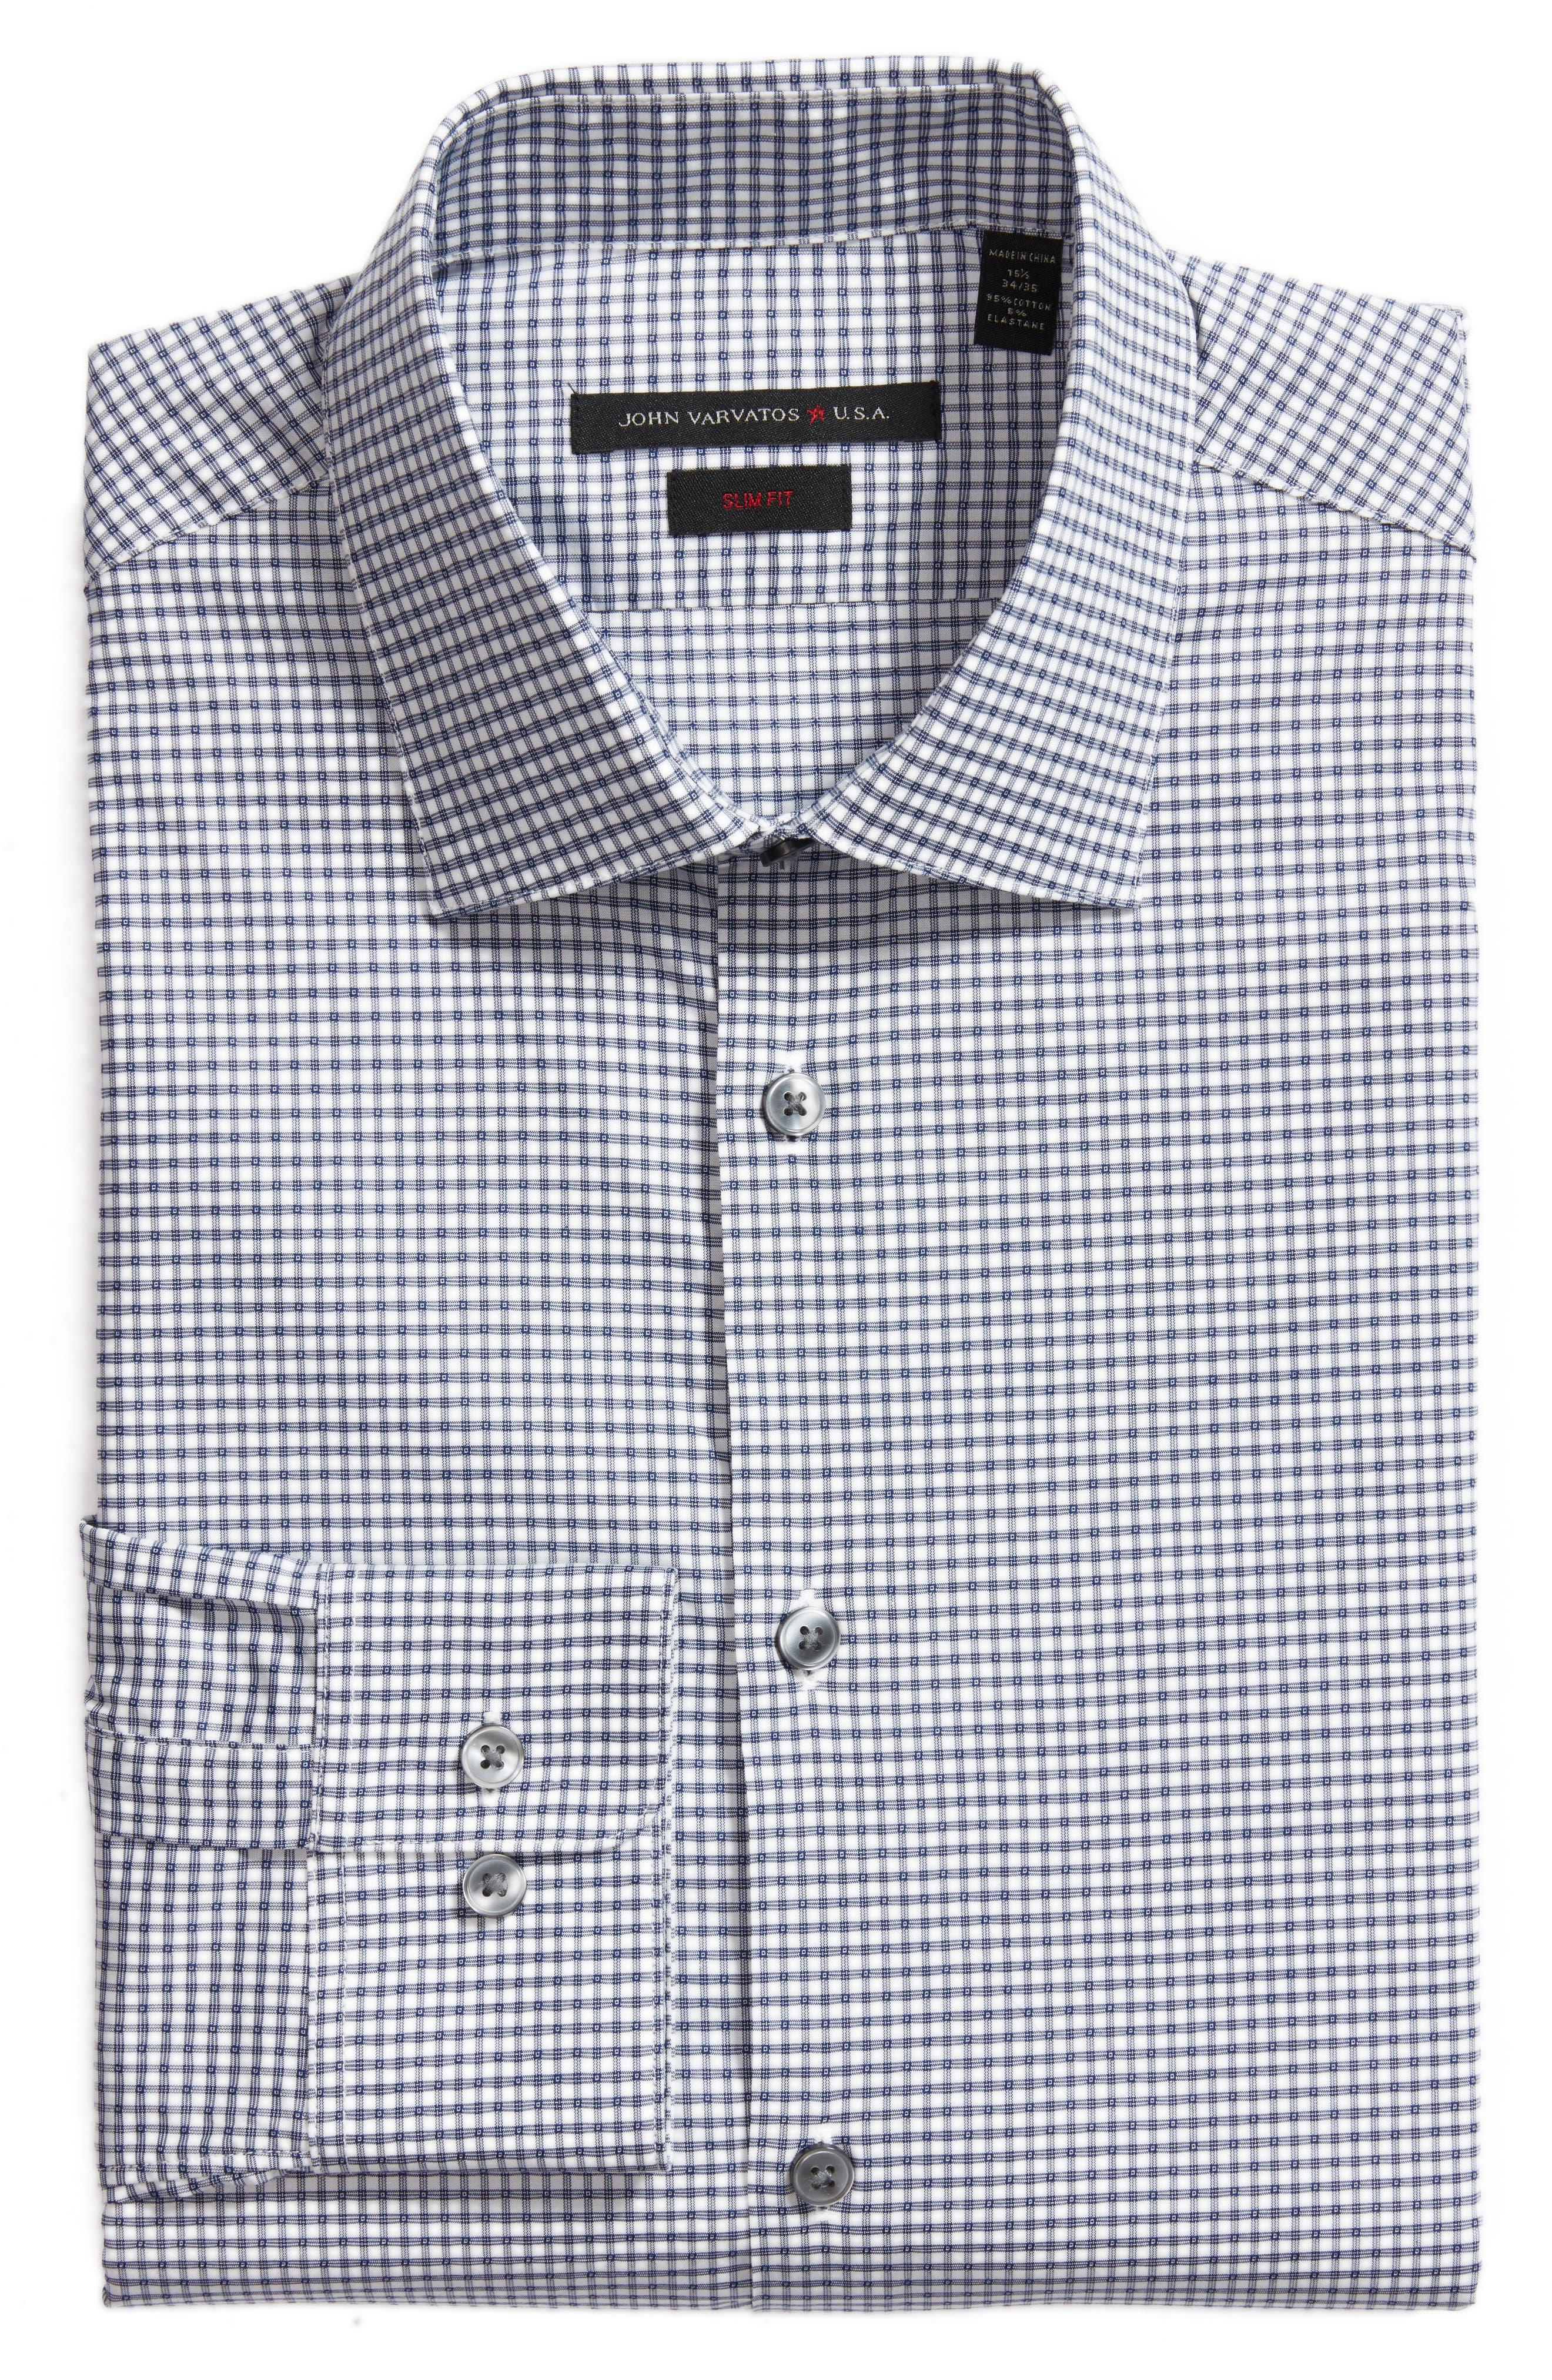 Slim Fit Stretch Check Dress Shirt,                             Alternate thumbnail 6, color,                             Indigo